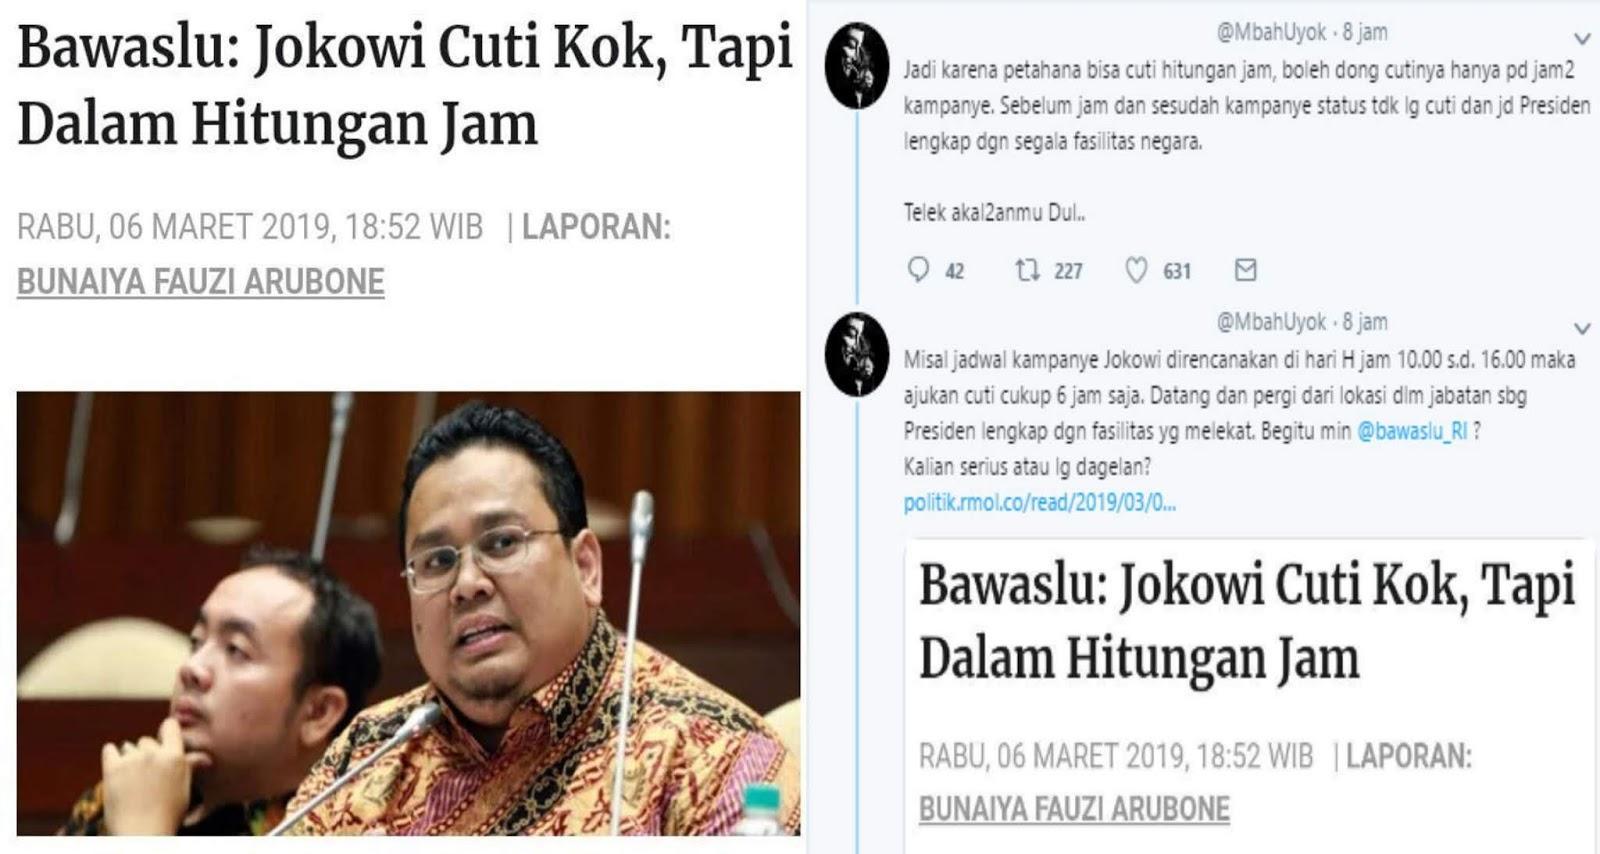 Bawaslu: Jokowi Cuti, Tai Dalam Hitungan Jam, Netizen: Bawaslu, Kalian Serius atau Dagelan?